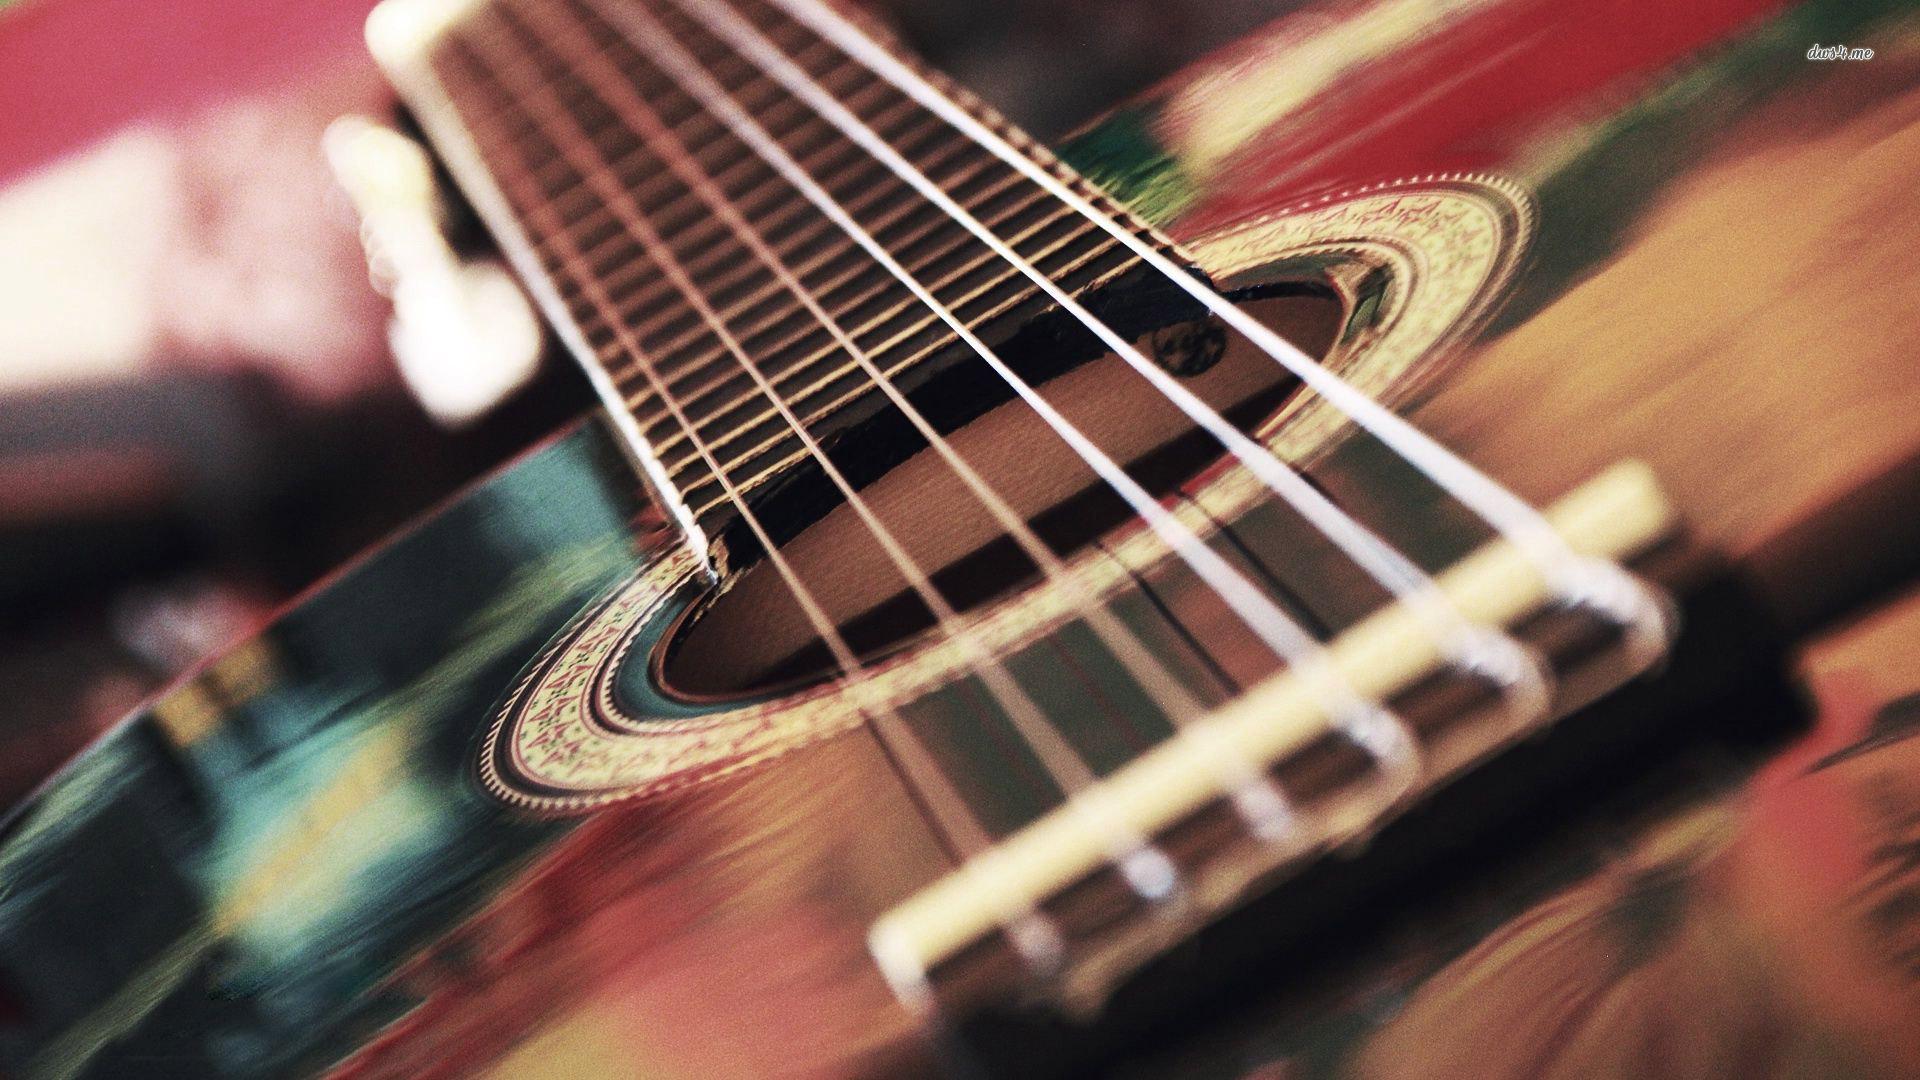 ... Acoustic guitar strings wallpaper 1920x1080 ...